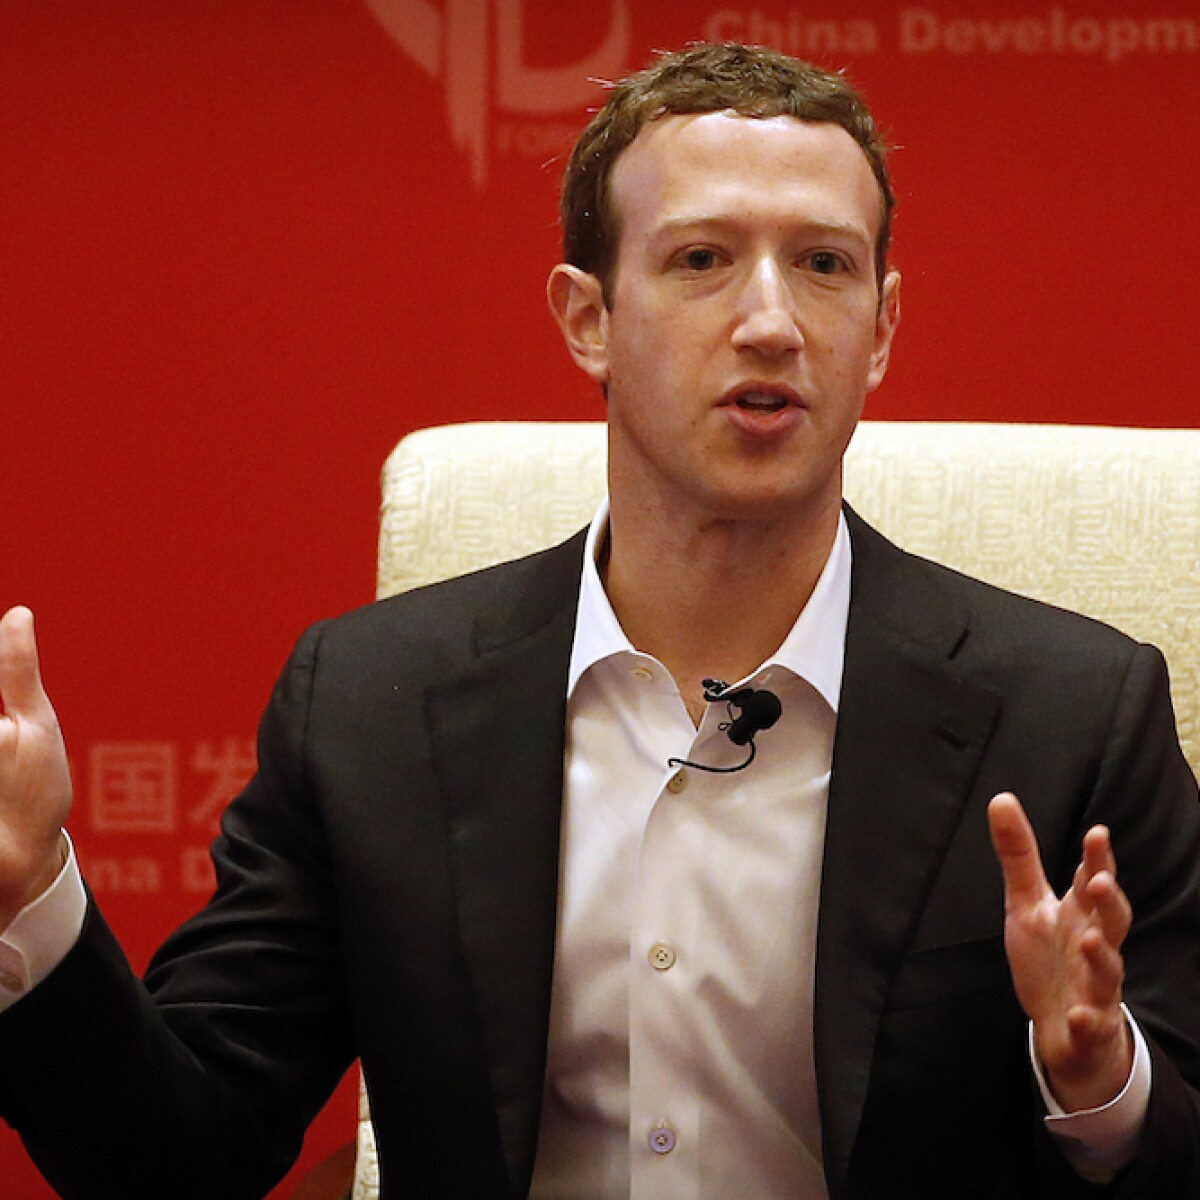 The Maturation Of Mark Zuckerberg New York Magazine: Facebook CEO Mark Zuckerberg On Cambridge Analytica Data